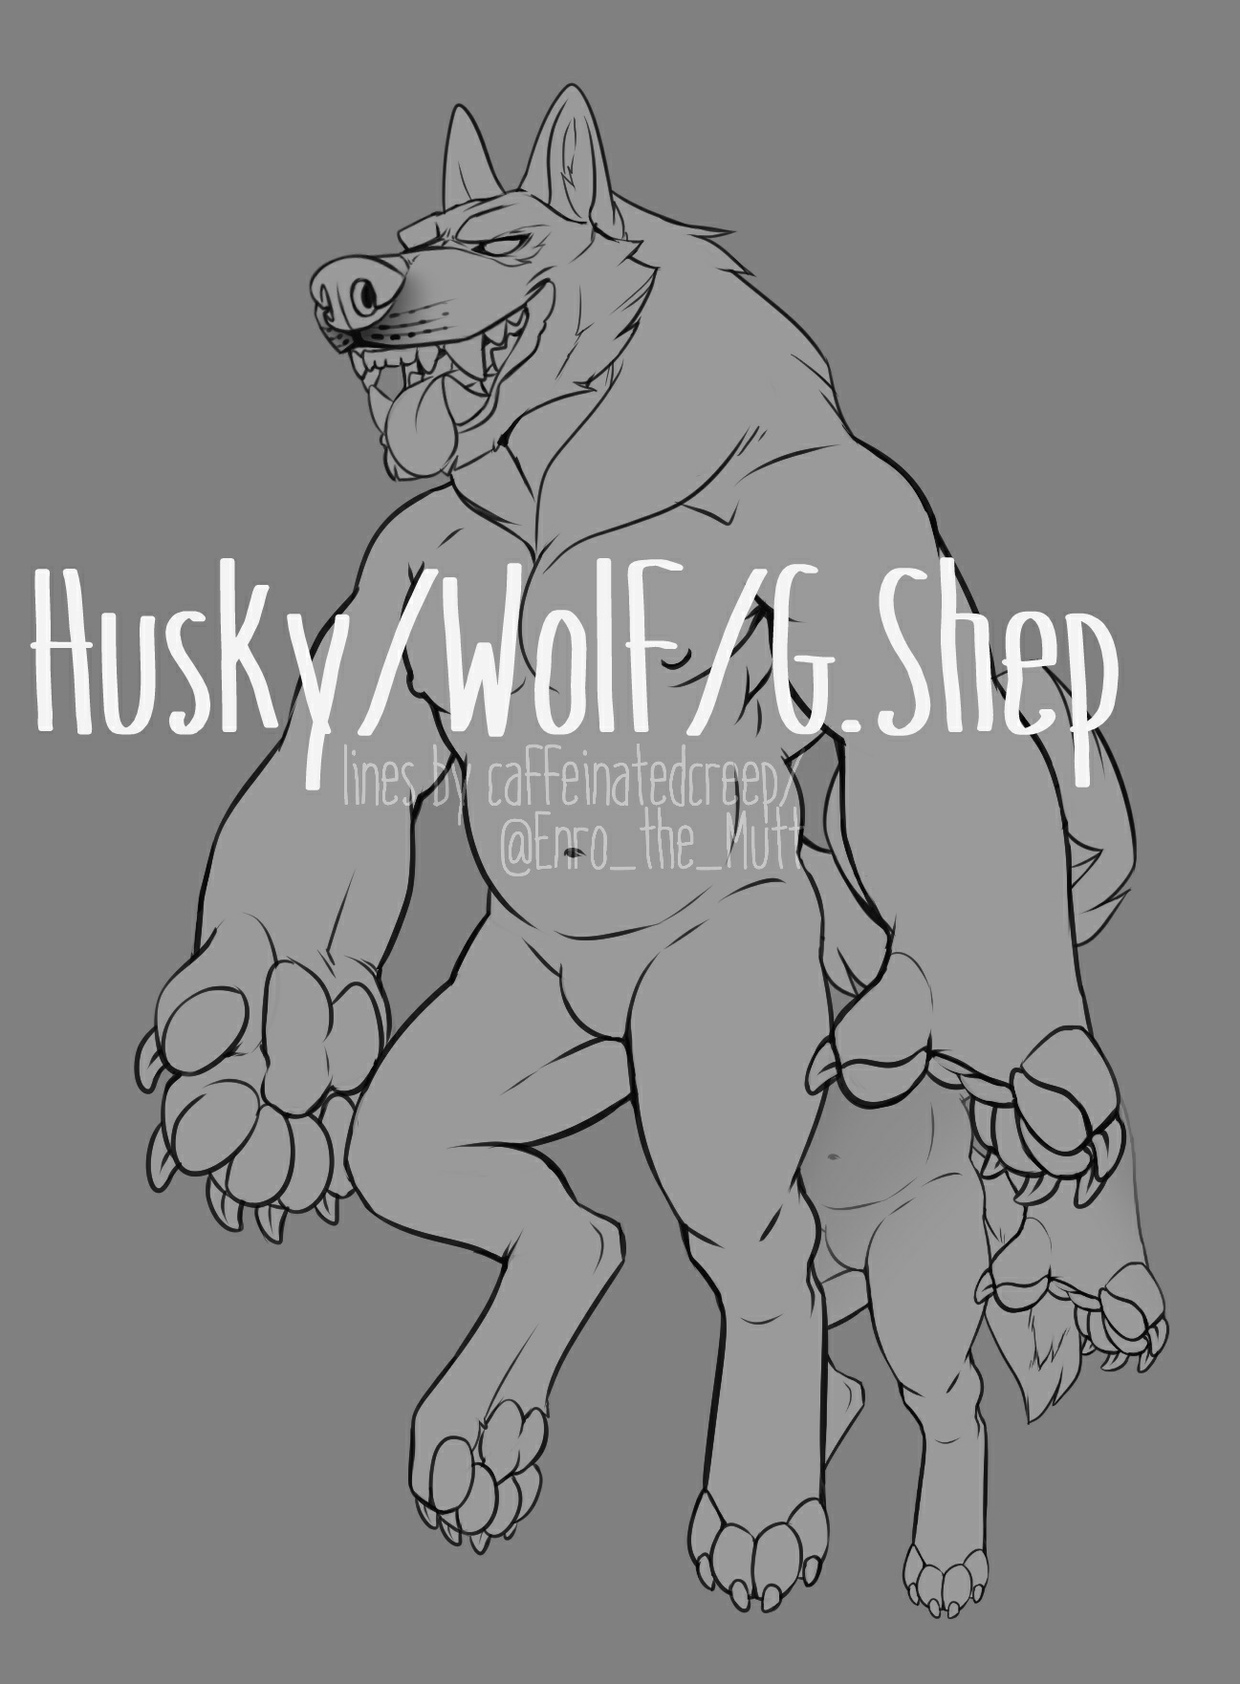 Husky/Wolf/G. Shep/Malamute/Shiba base